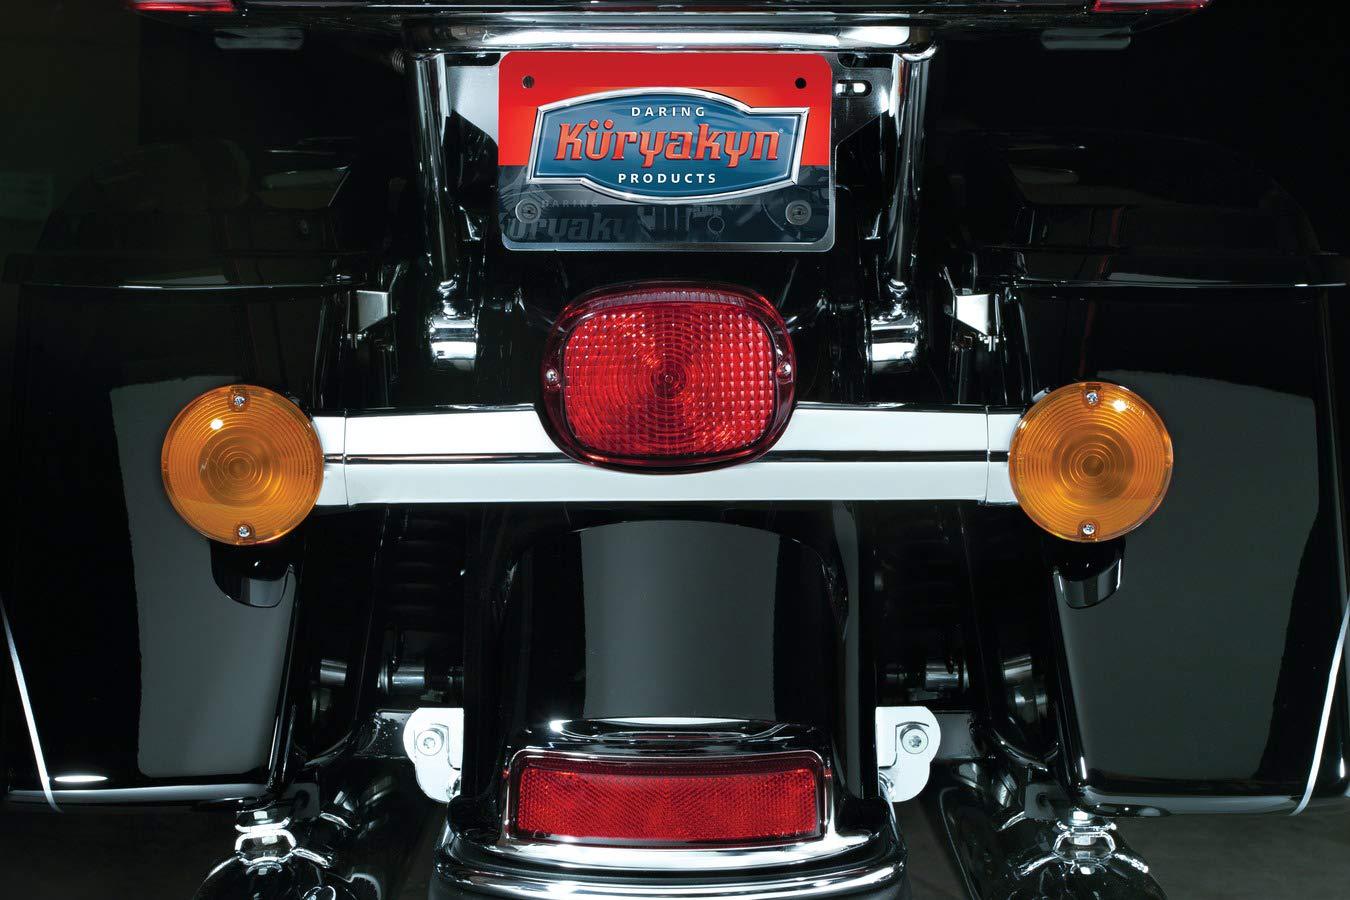 Low Profile Panacea LED Taillight without License Plate Illumination Light for 2009-13 Harley-Davidson Motorcycles Smoke Lens Kuryakyn 5427 Motorcycle Lighting